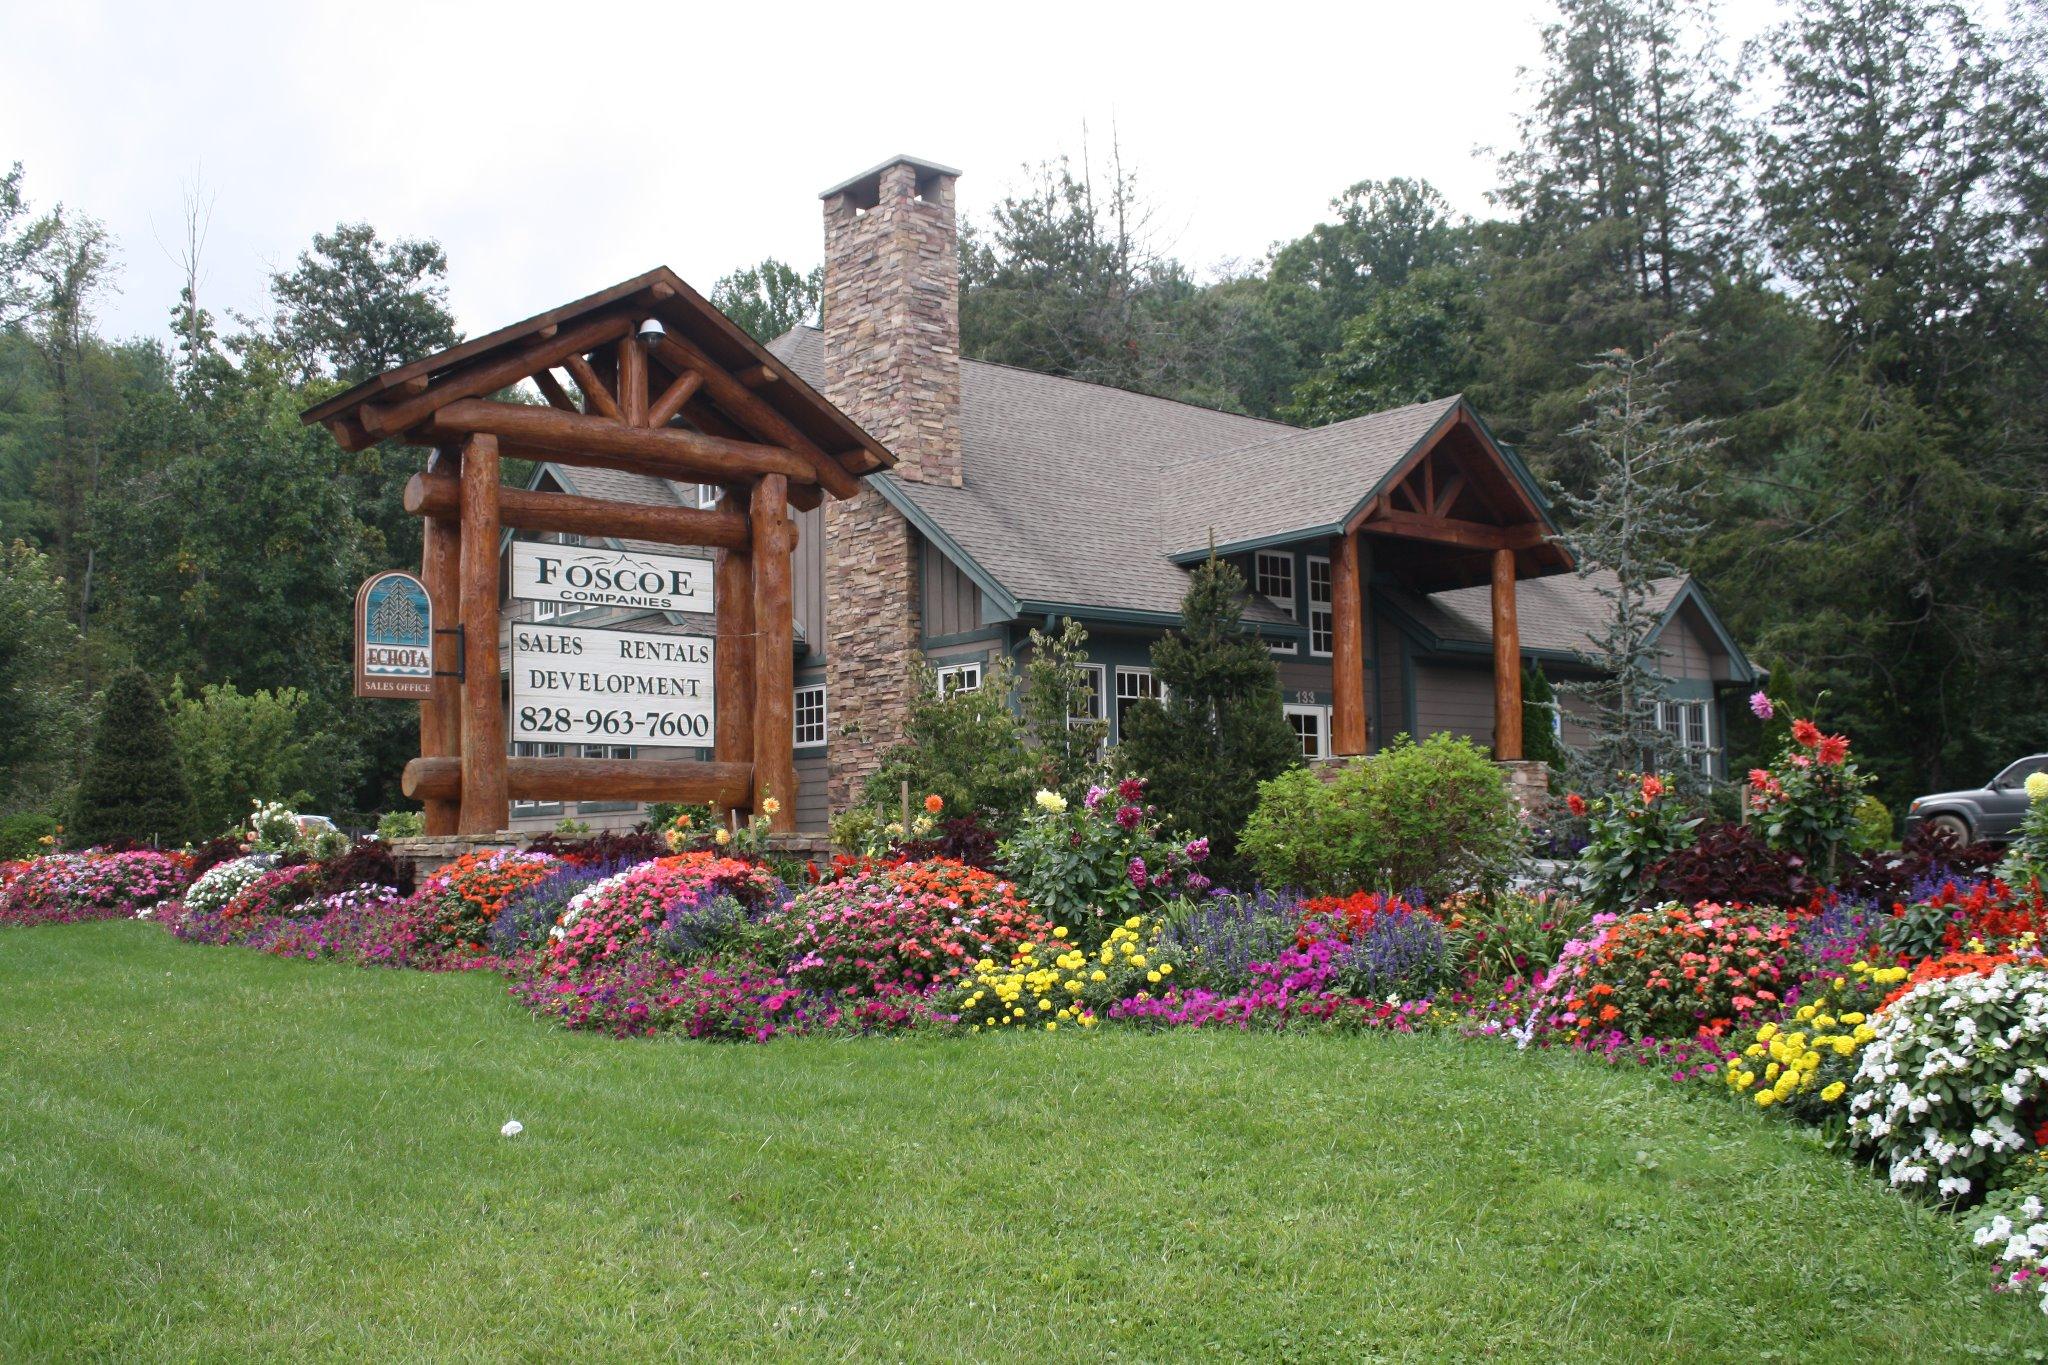 Foscoe Companies Rentals Real Estate Property Management Boone North Carolina